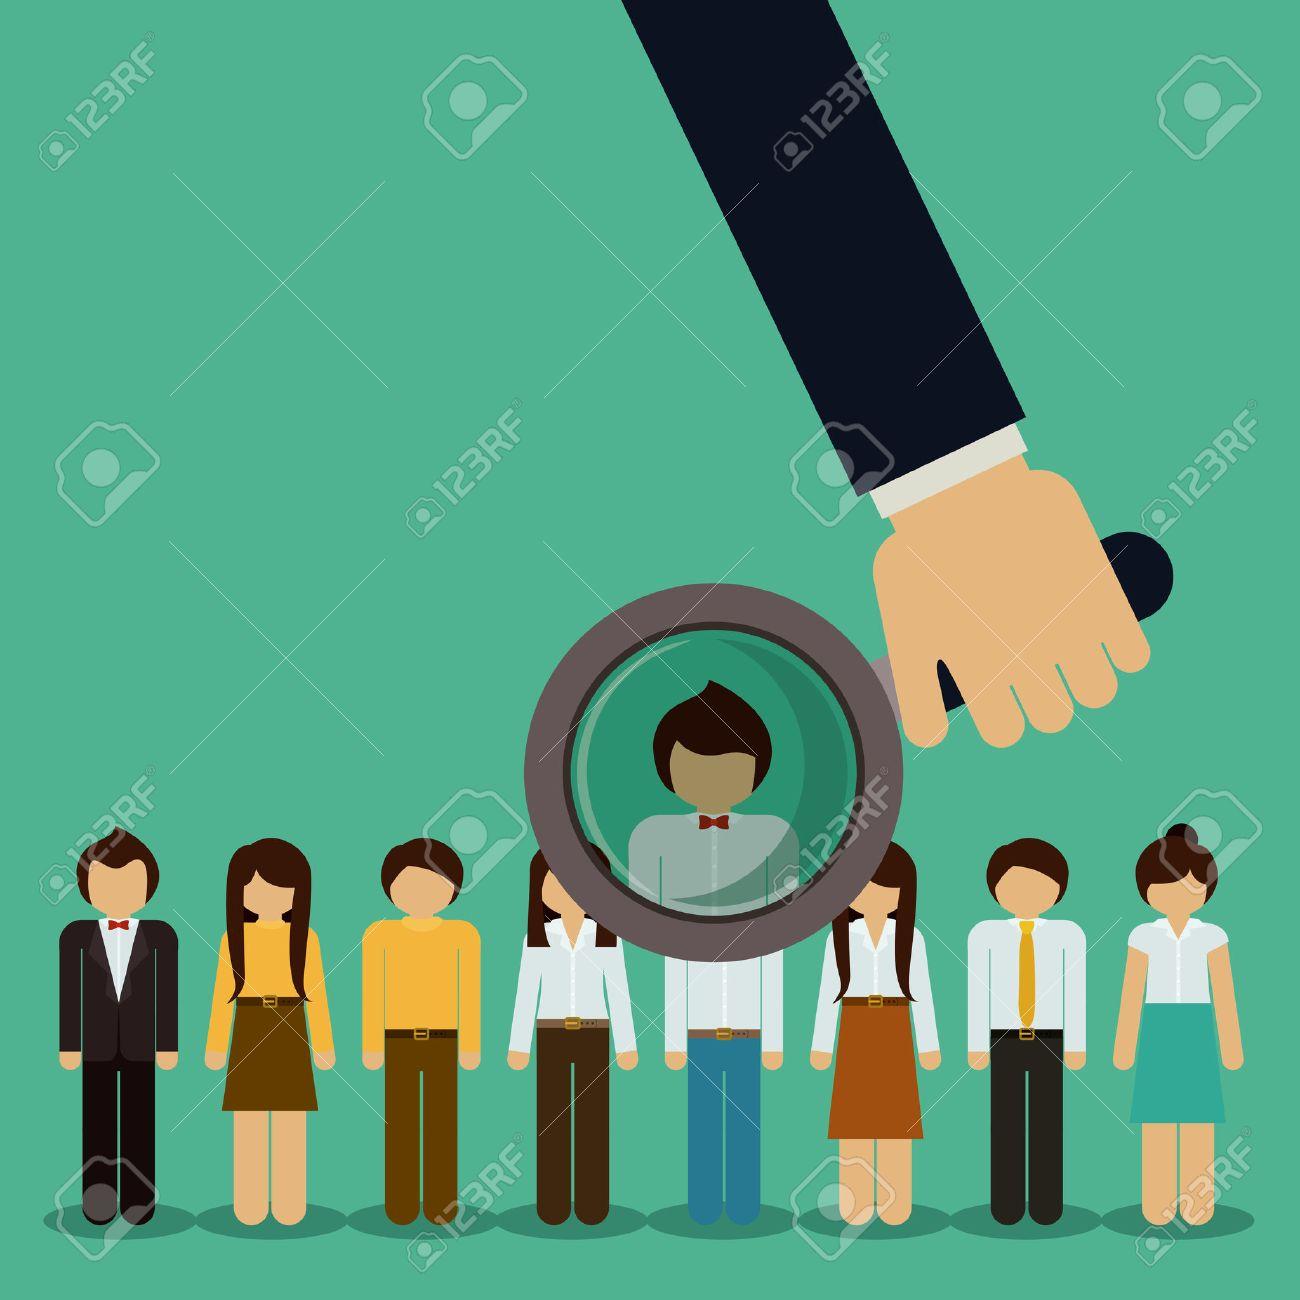 Human Resources design over green background, vector illustration - 40204027